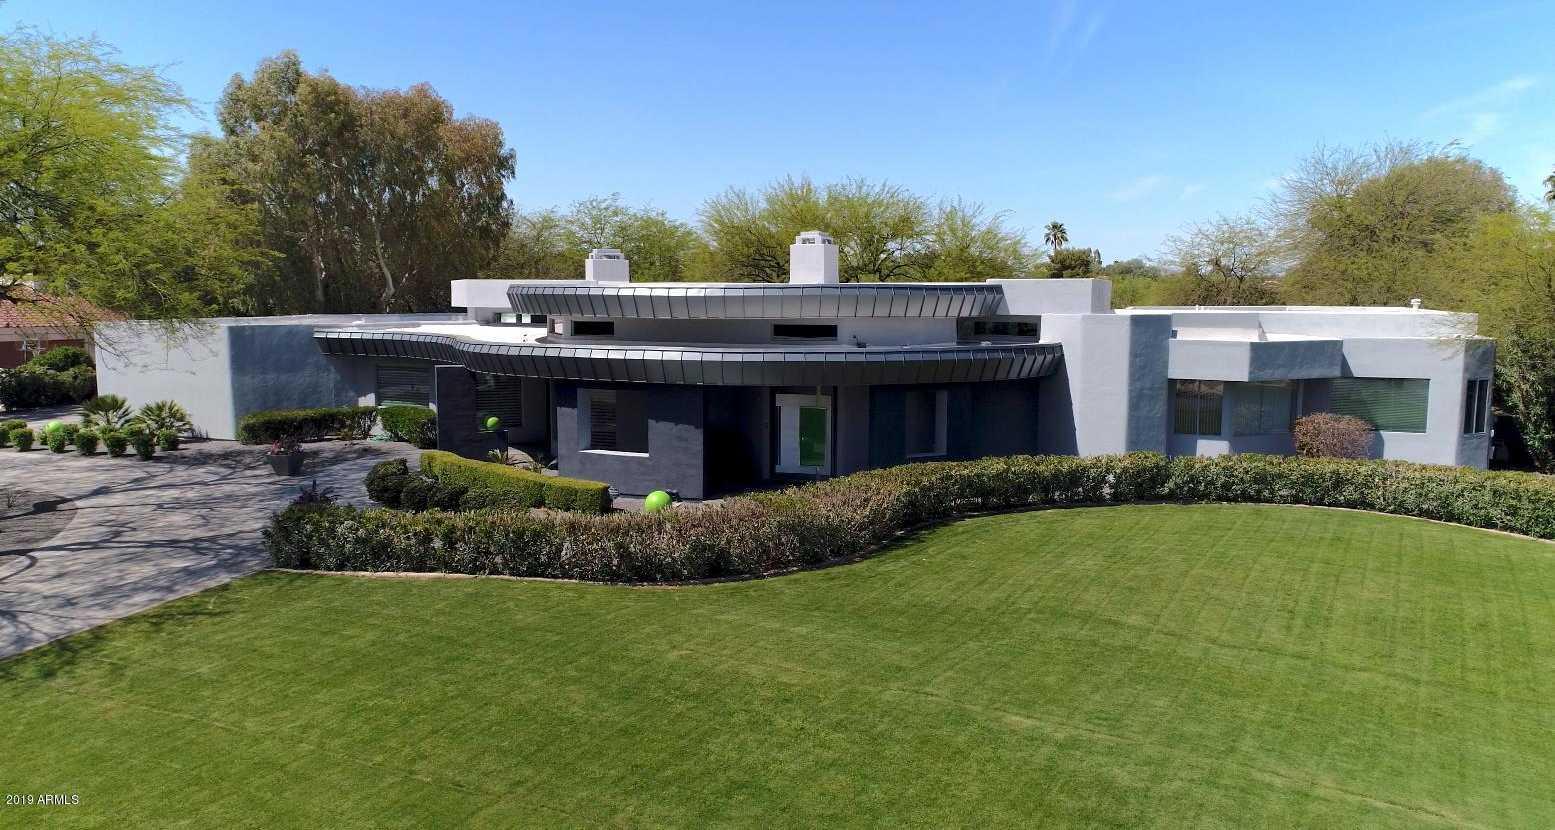 $2,200,000 - 5Br/4Ba - Home for Sale in Sandringham Lot 1-20, Paradise Valley